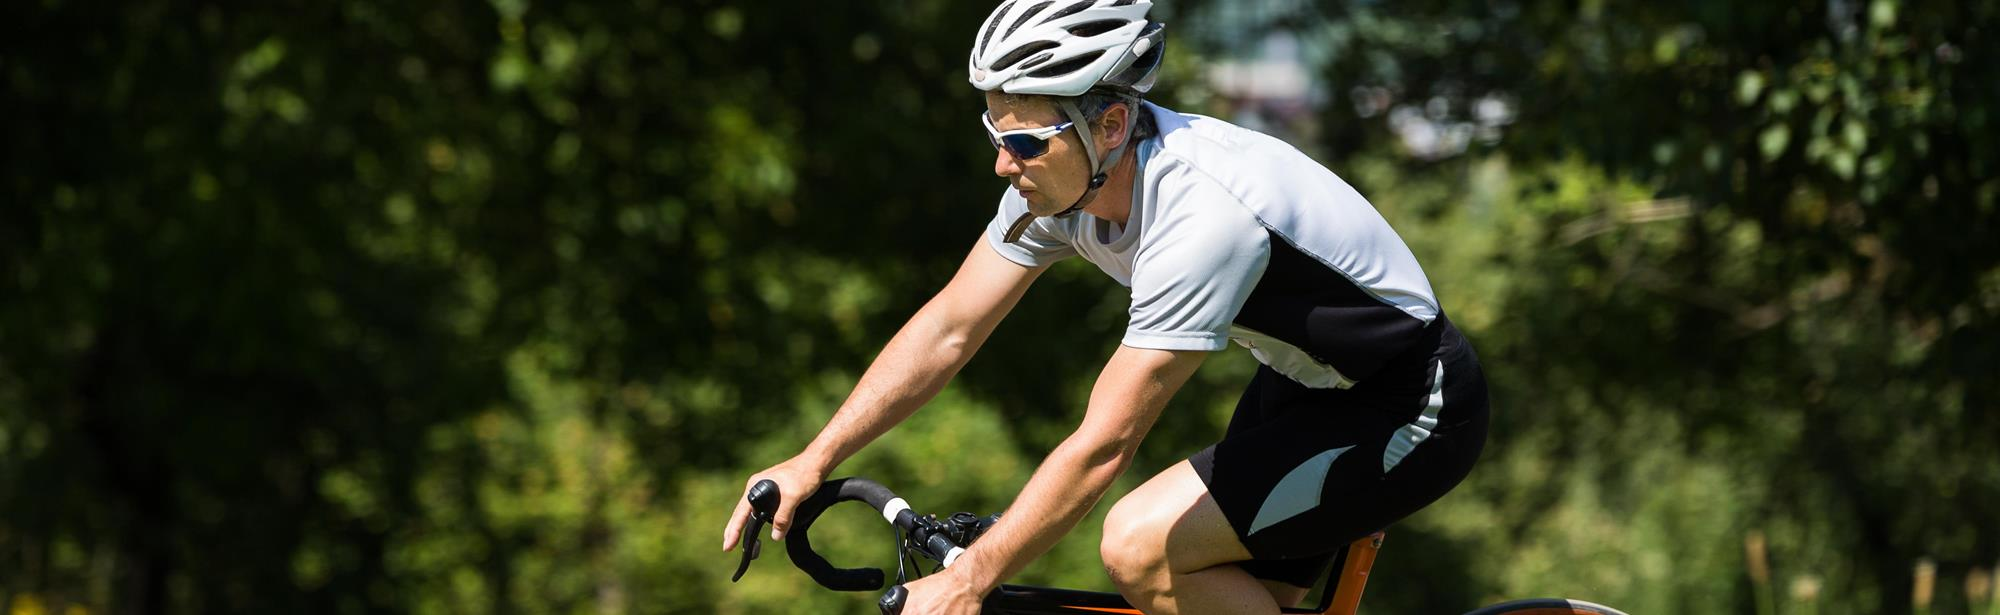 Amstel Gold Race-Lus 1 Zuid-Limburg